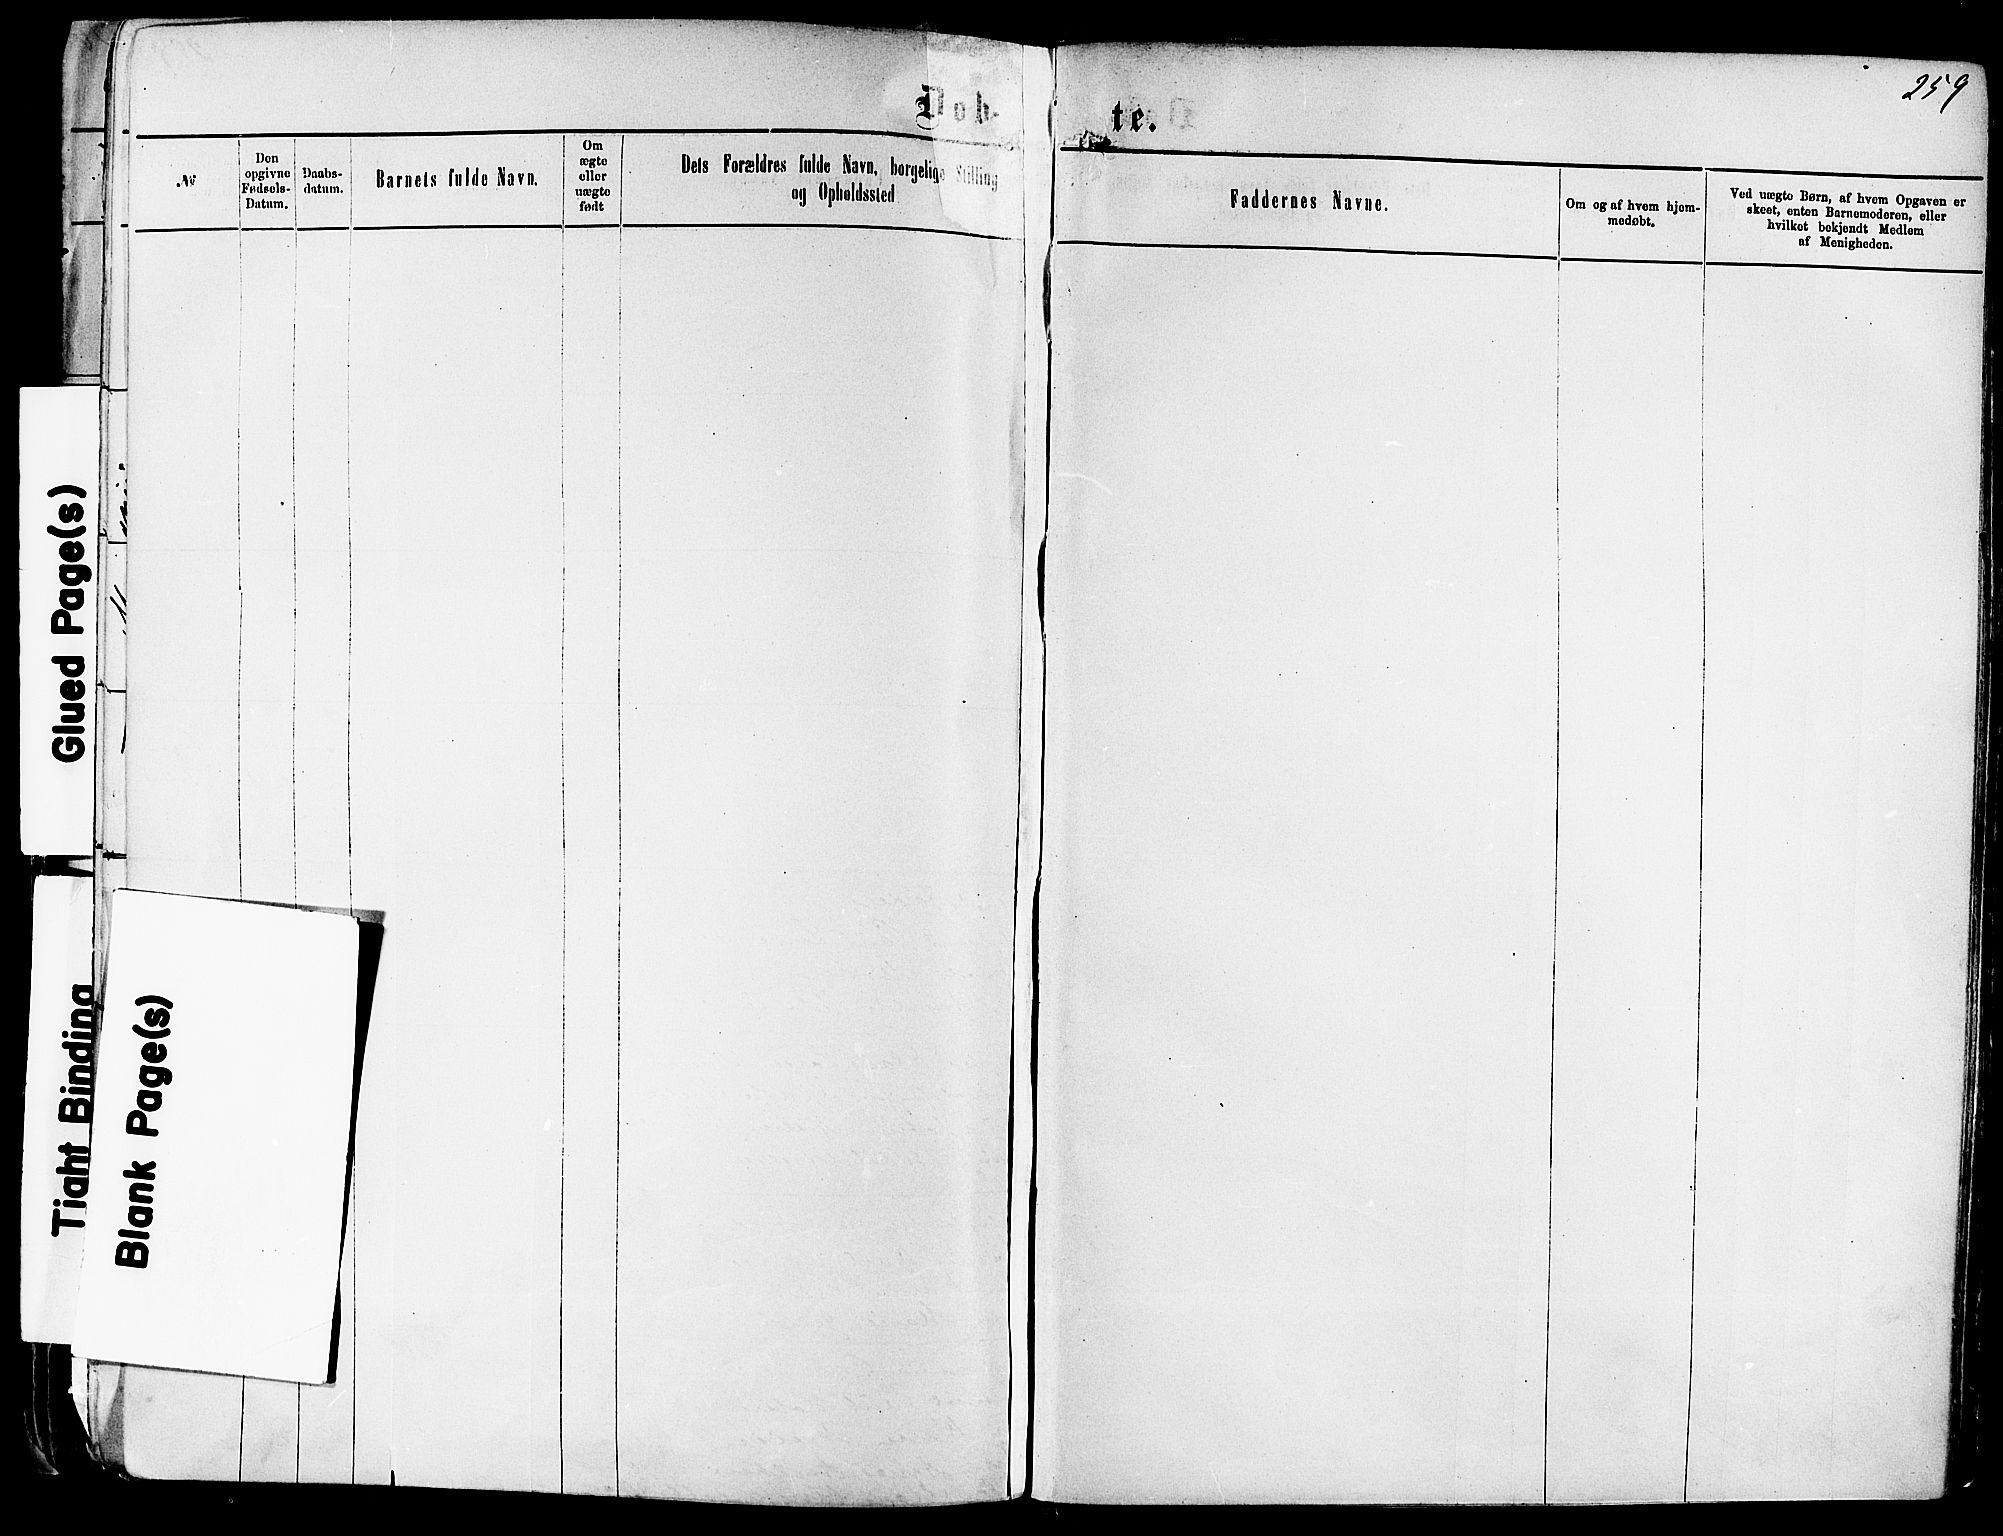 SAKO, Kragerø kirkebøker, F/Fa/L0011: Ministerialbok nr. 11, 1875-1886, s. 259